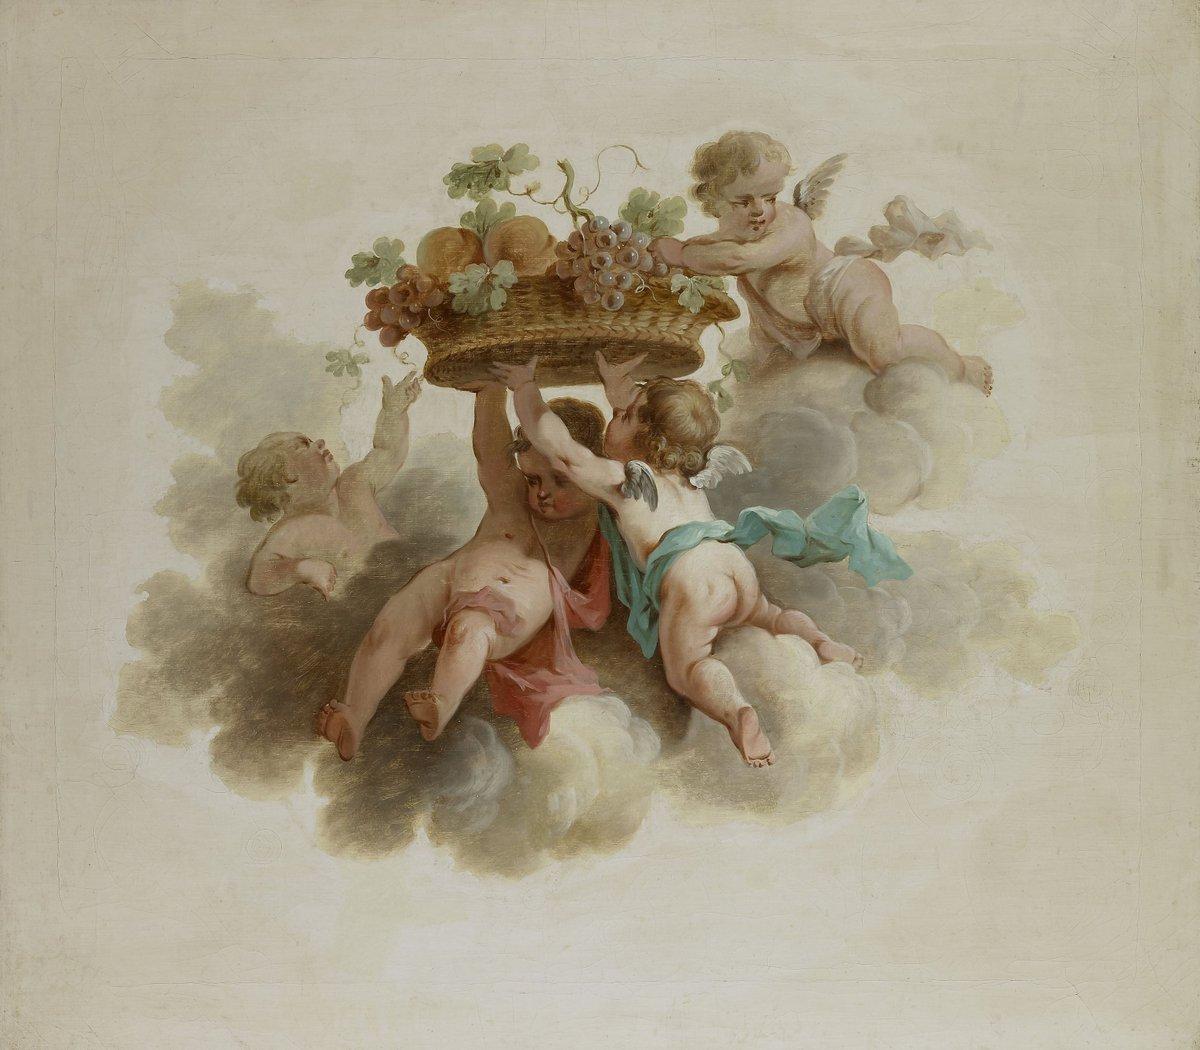 Rijksmuseum-onbekende-kunstenaar-vier-putti-in-de-wolken-vruchtenmand